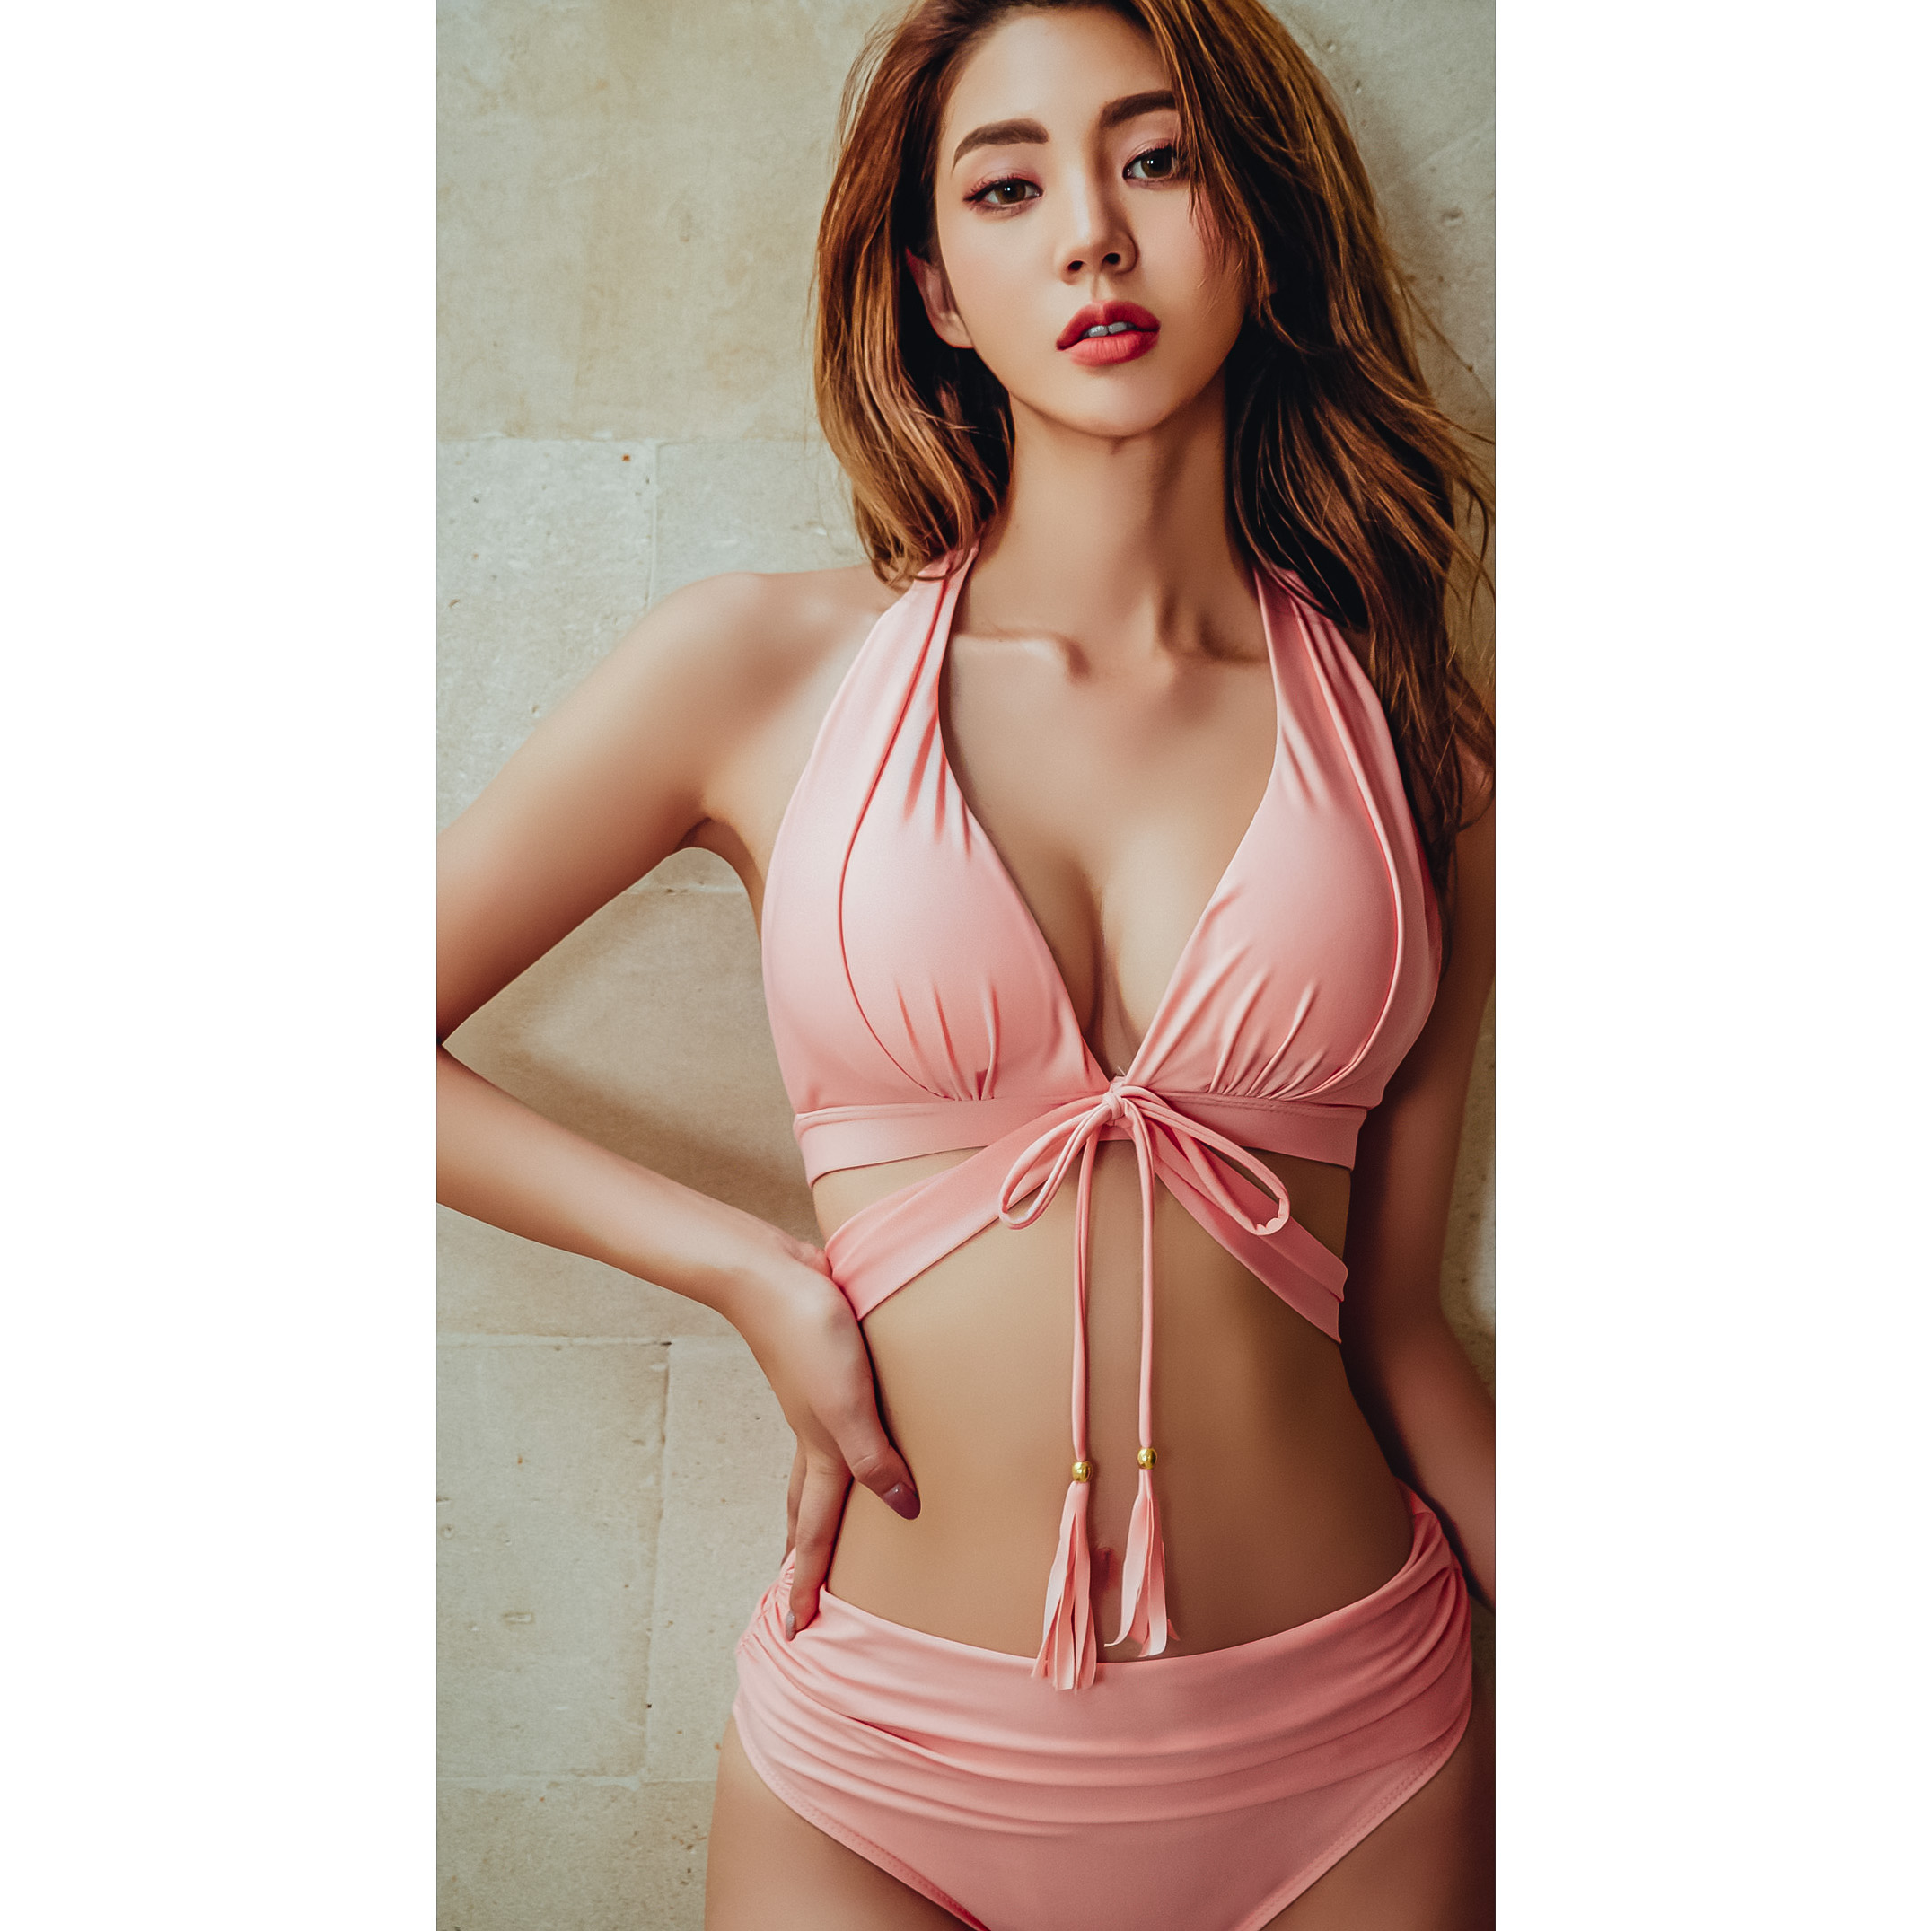 Sexy Pink High Waist Push Up Bikini 2020 Bandage Swimsuit Women Tassle Swimwear Beach Wear Swim